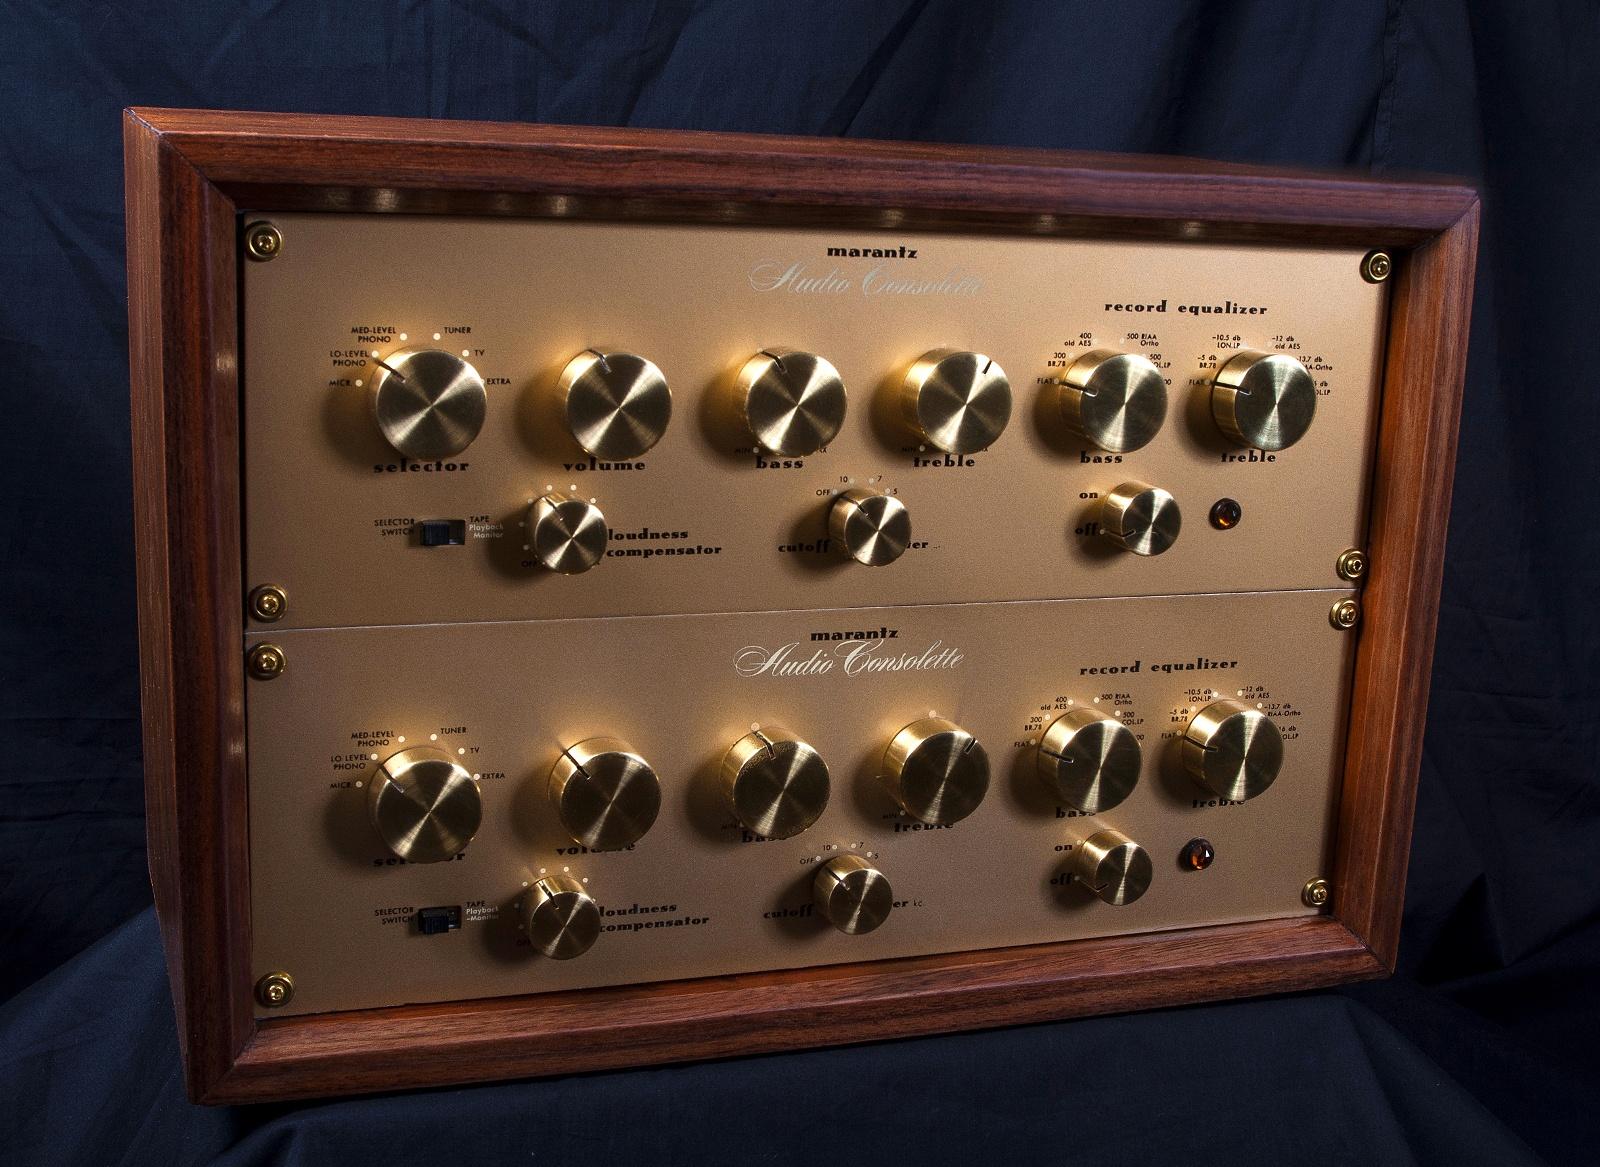 История аудиоаппаратуры класса High-End - 2